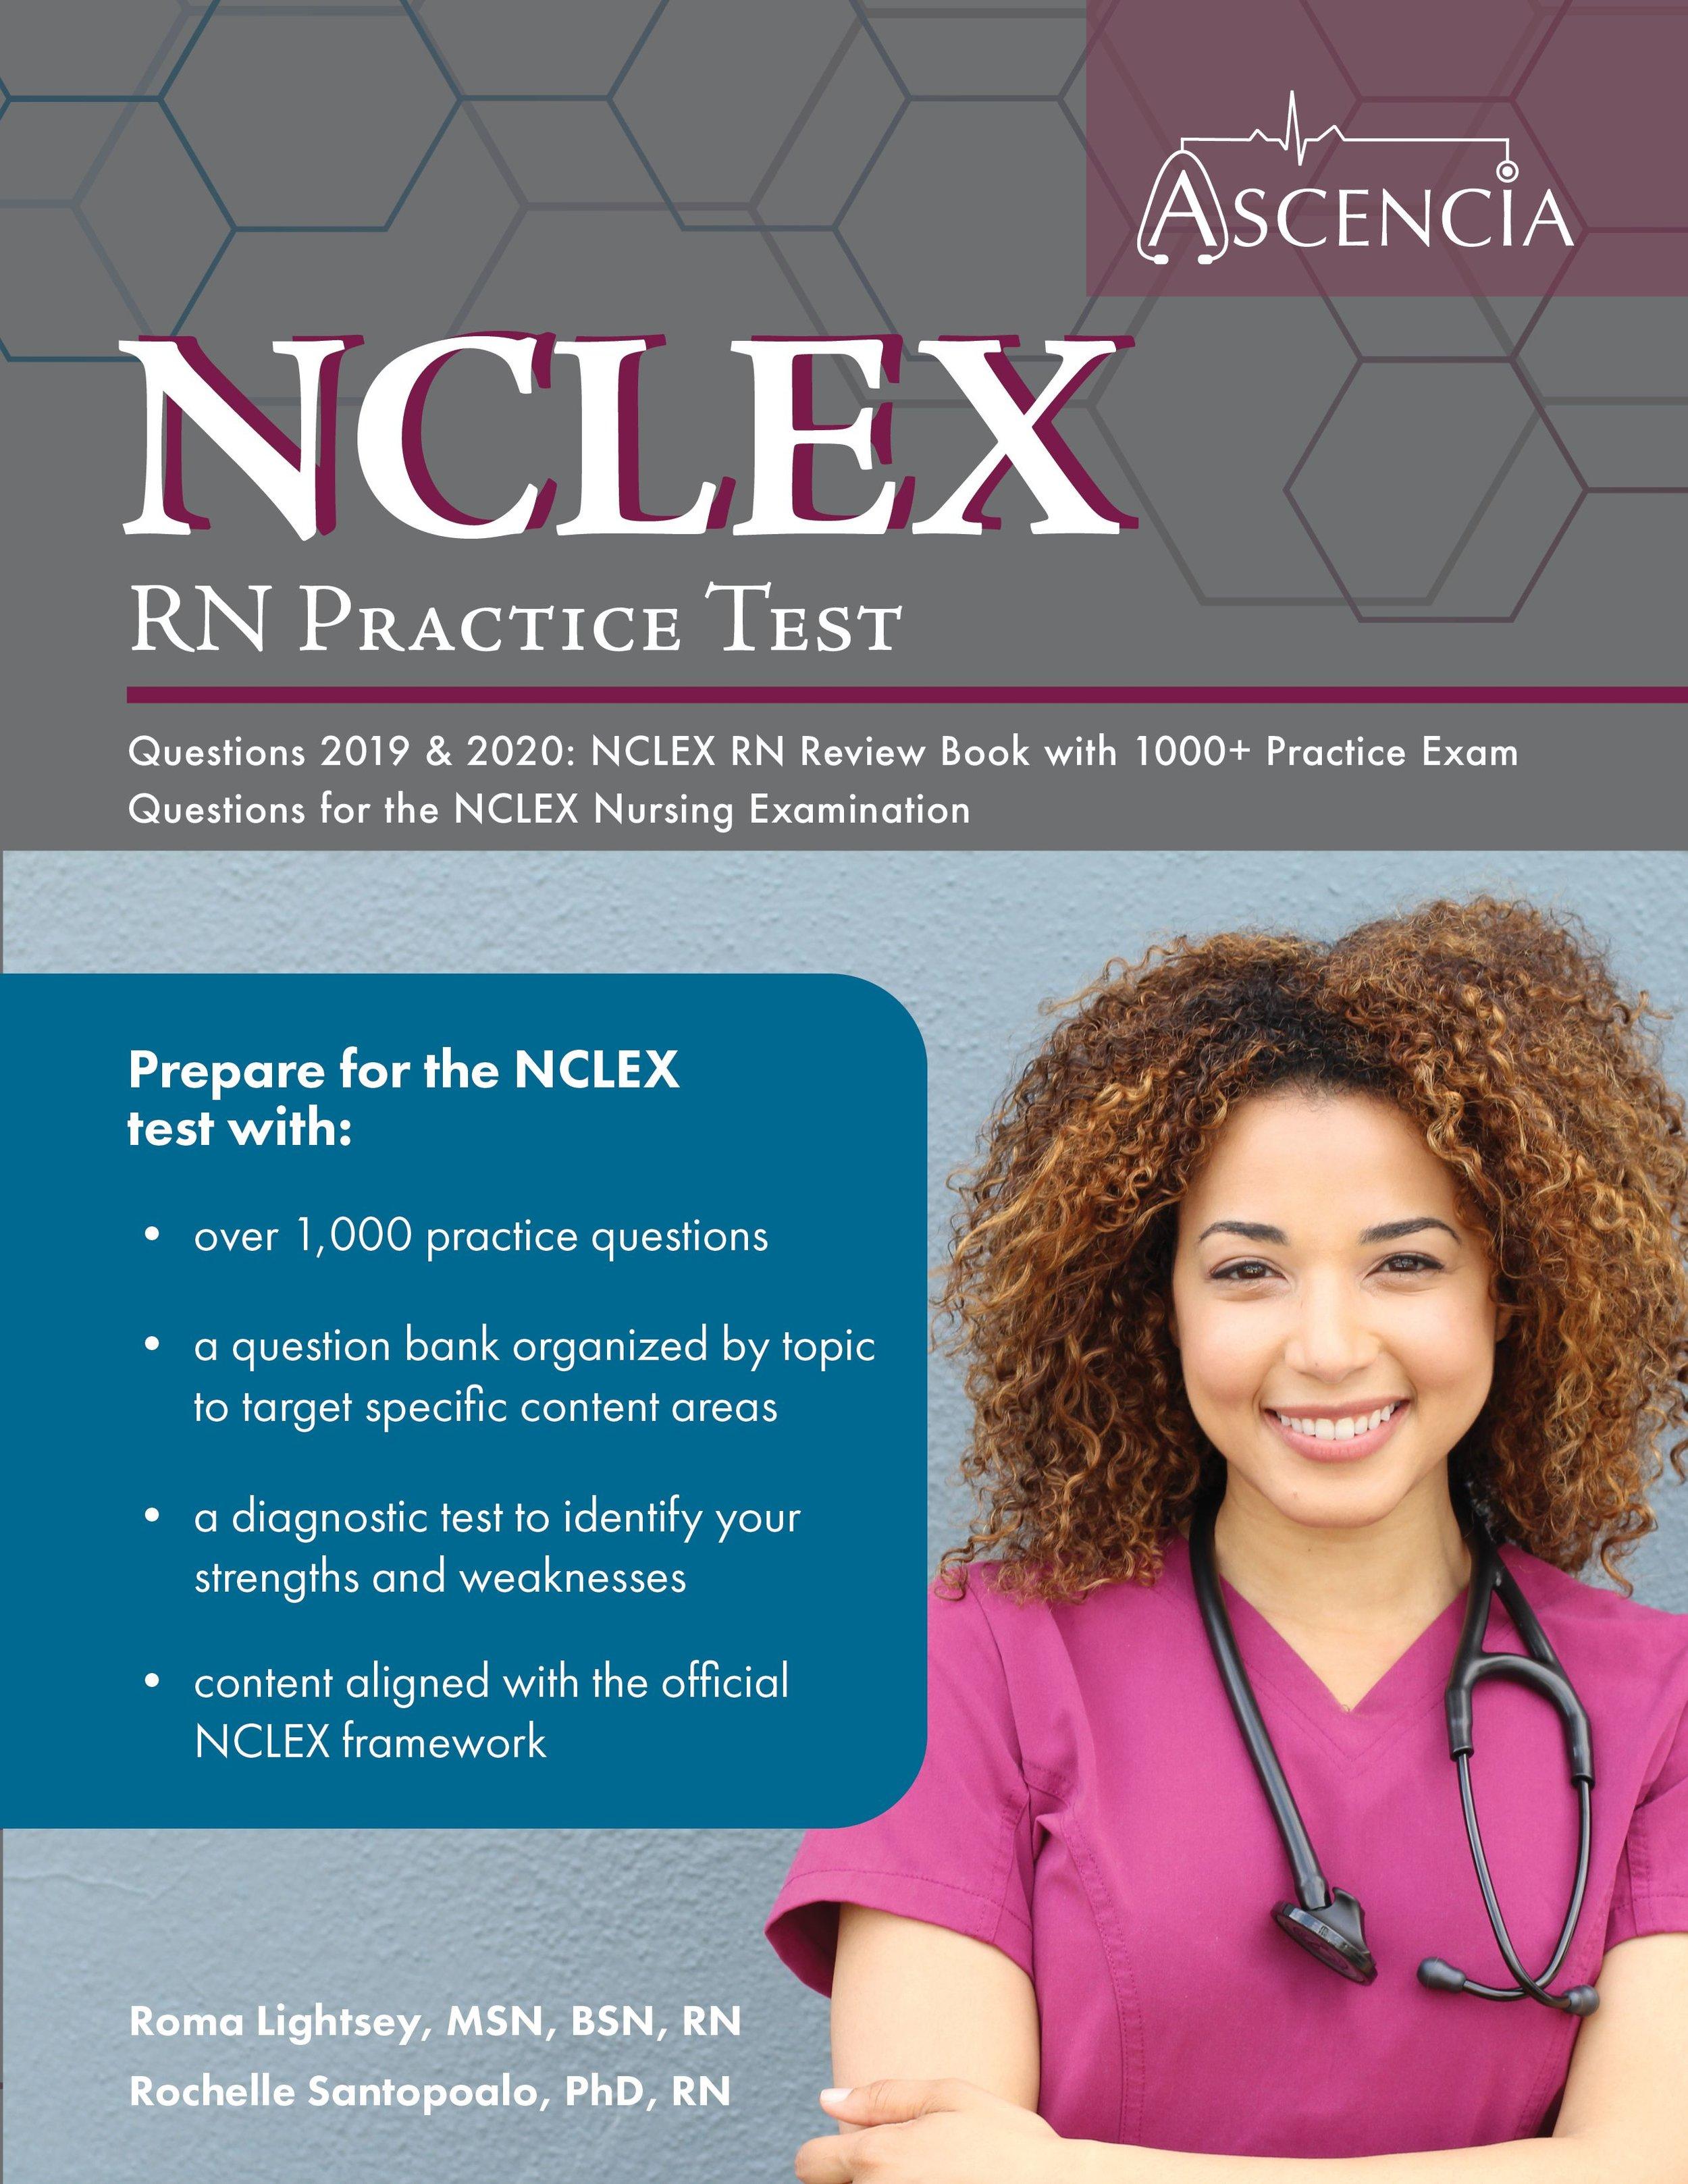 NCLEX-RN Practice Questions 2019 & 2020 — Ascencia Test Prep